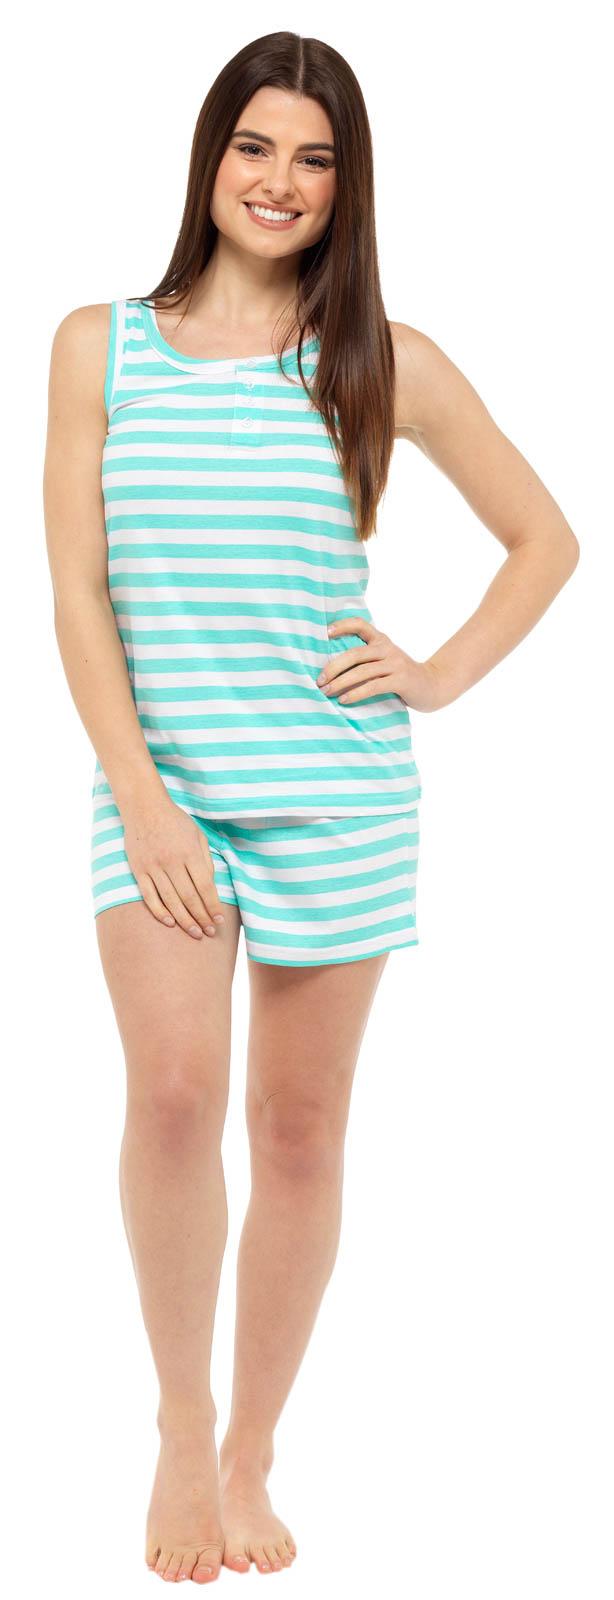 Womens Pyjamas Vest Top and Shorts Set 2 Piece Short Pjs Ladies Nightwear Size